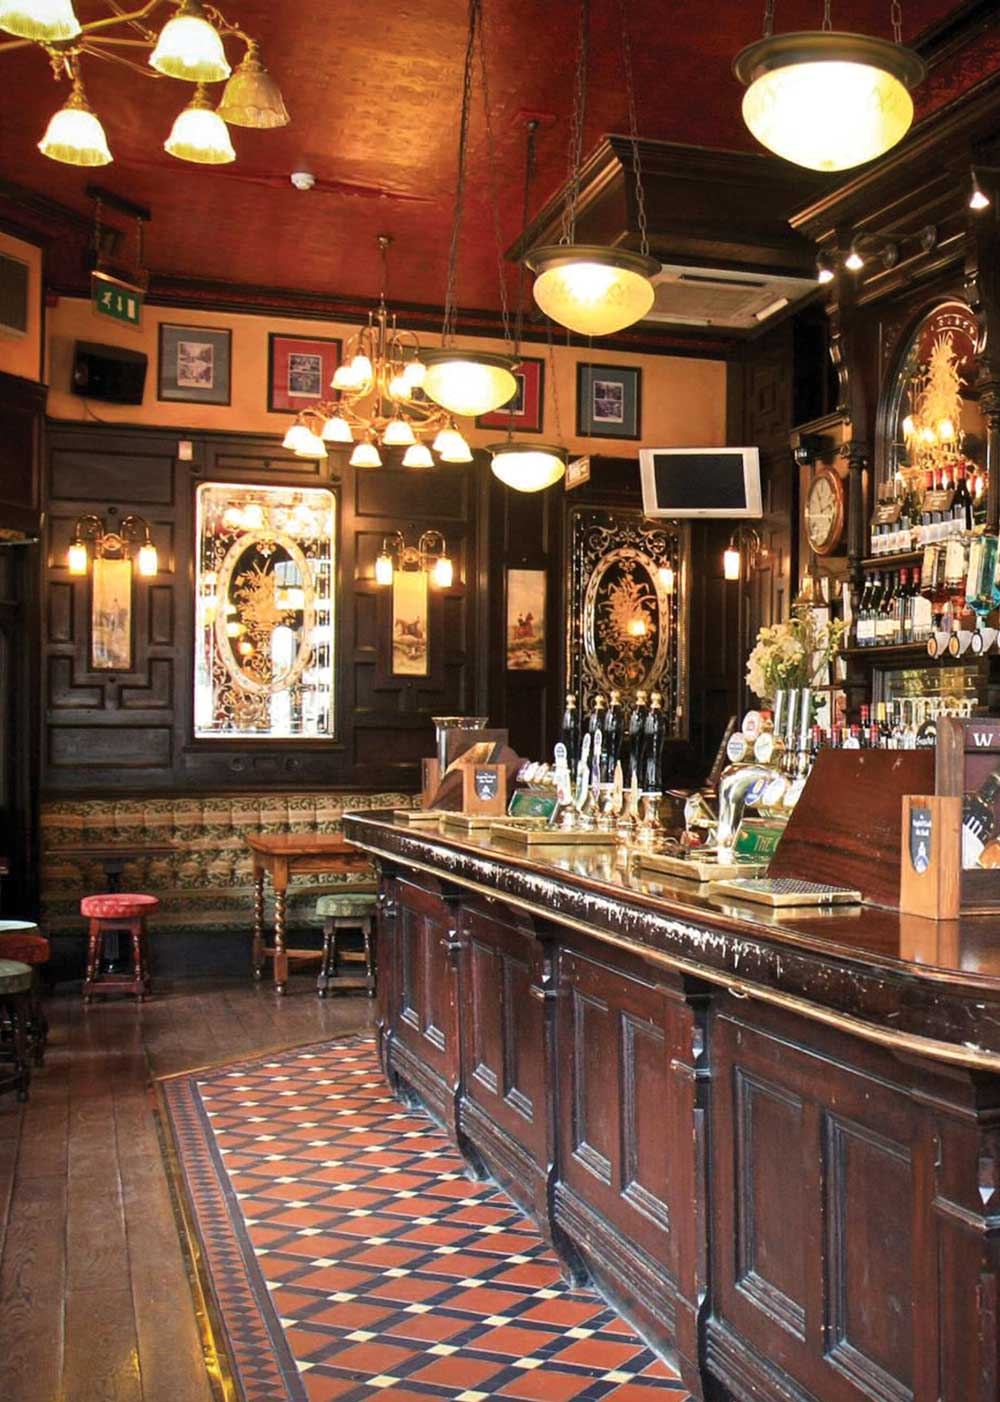 Country Cottage authentic Irish Pub Design  - view of interior bar soft yellow lighting decorated with Irish trinkets.